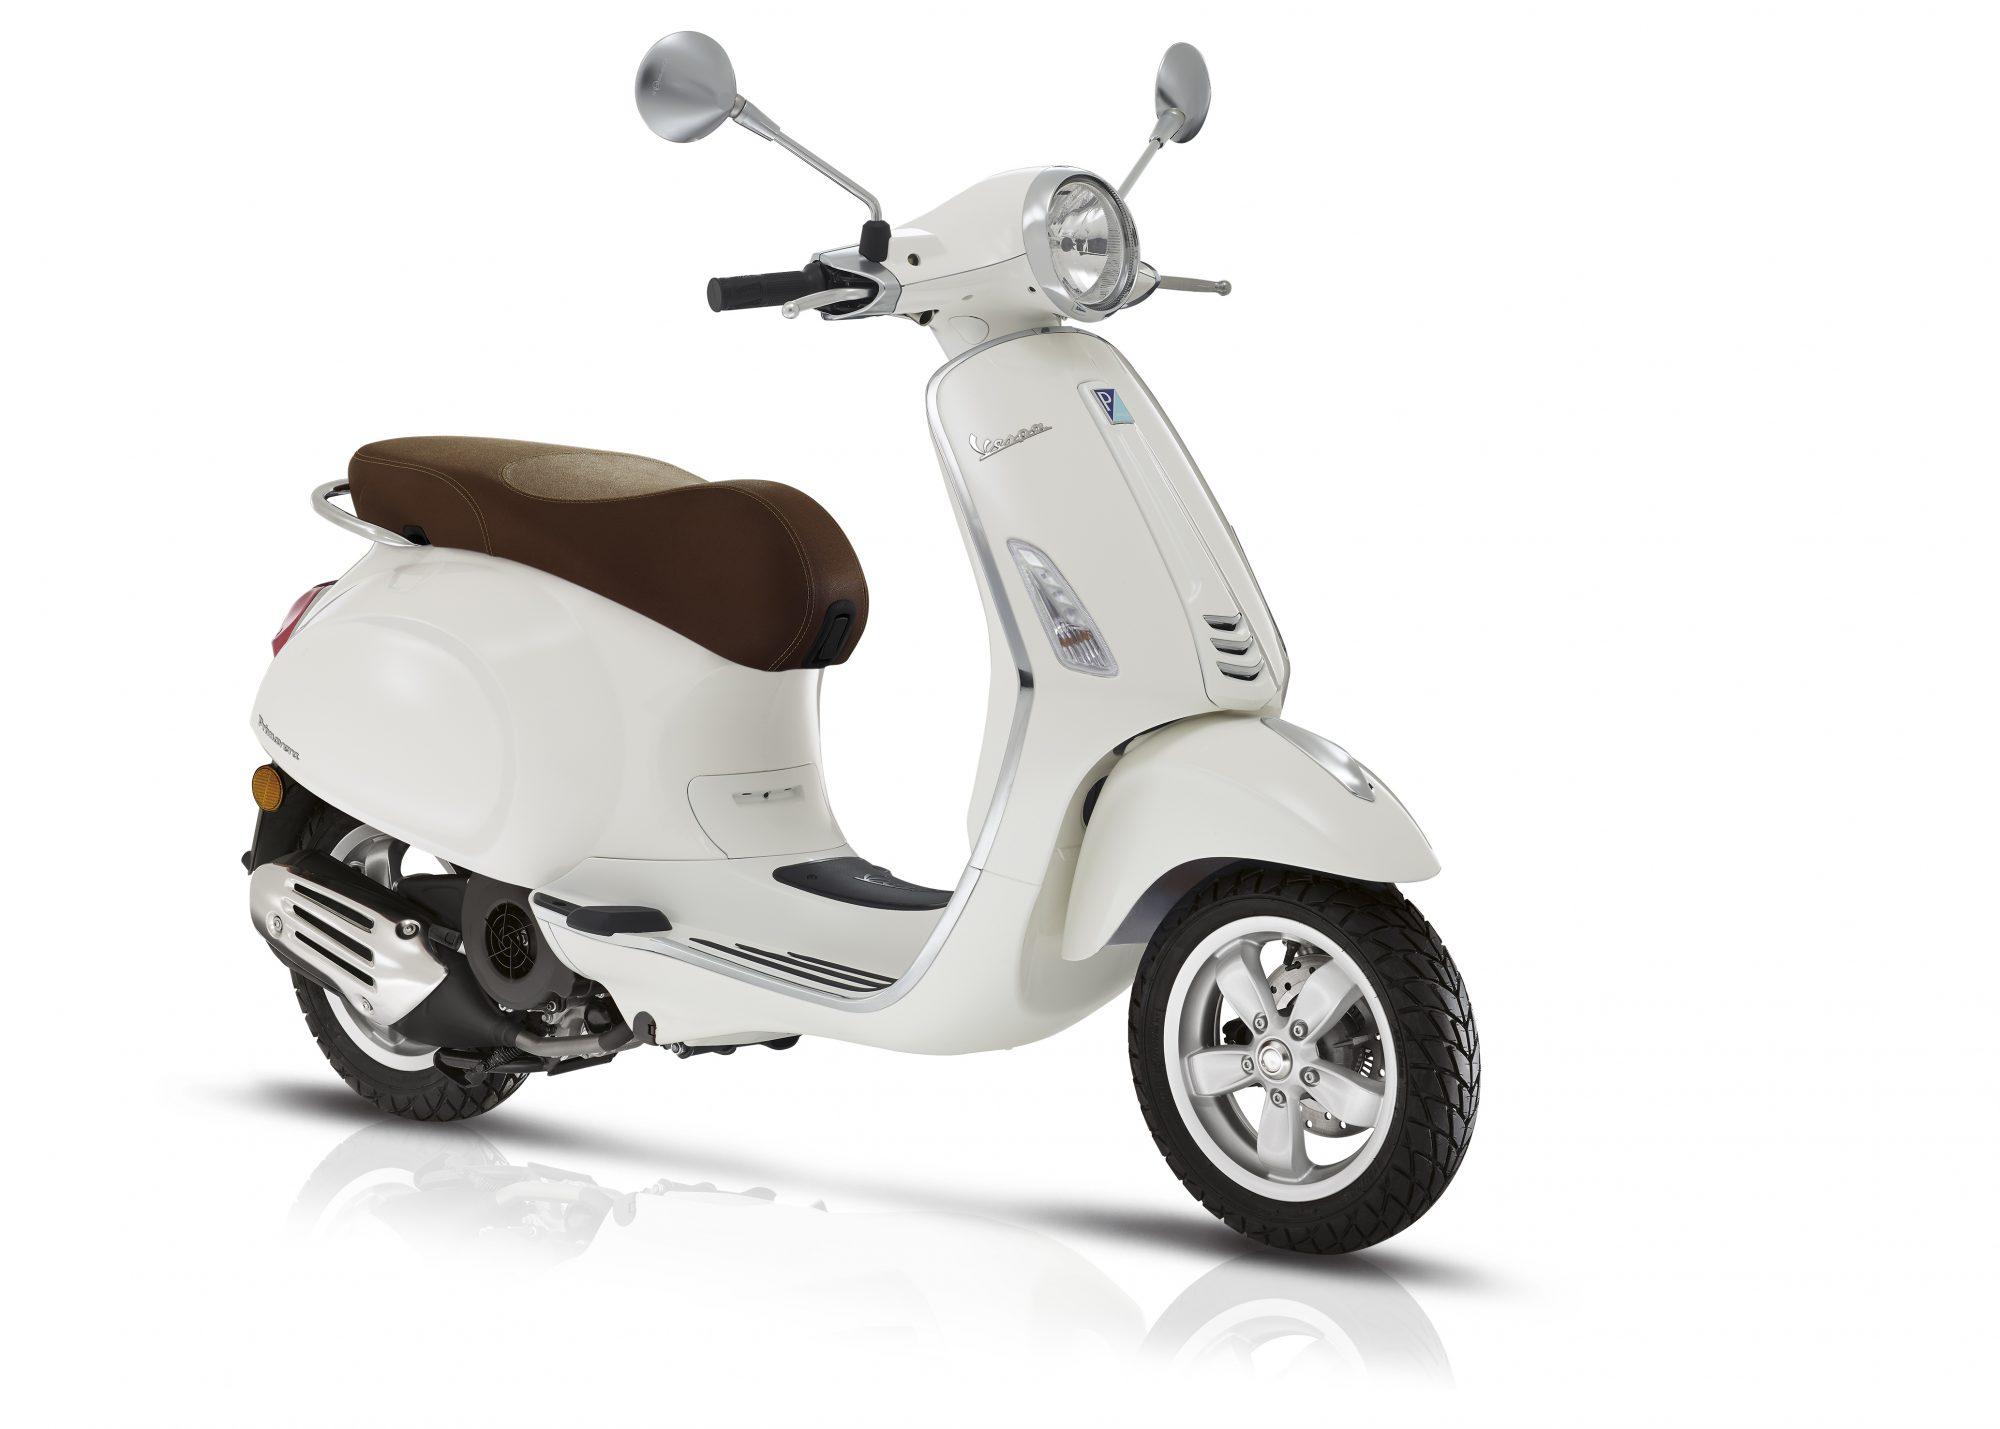 be6a177b21213a Vespa Primavera Wit scooters leasen? Vespa Primavera Wit ...